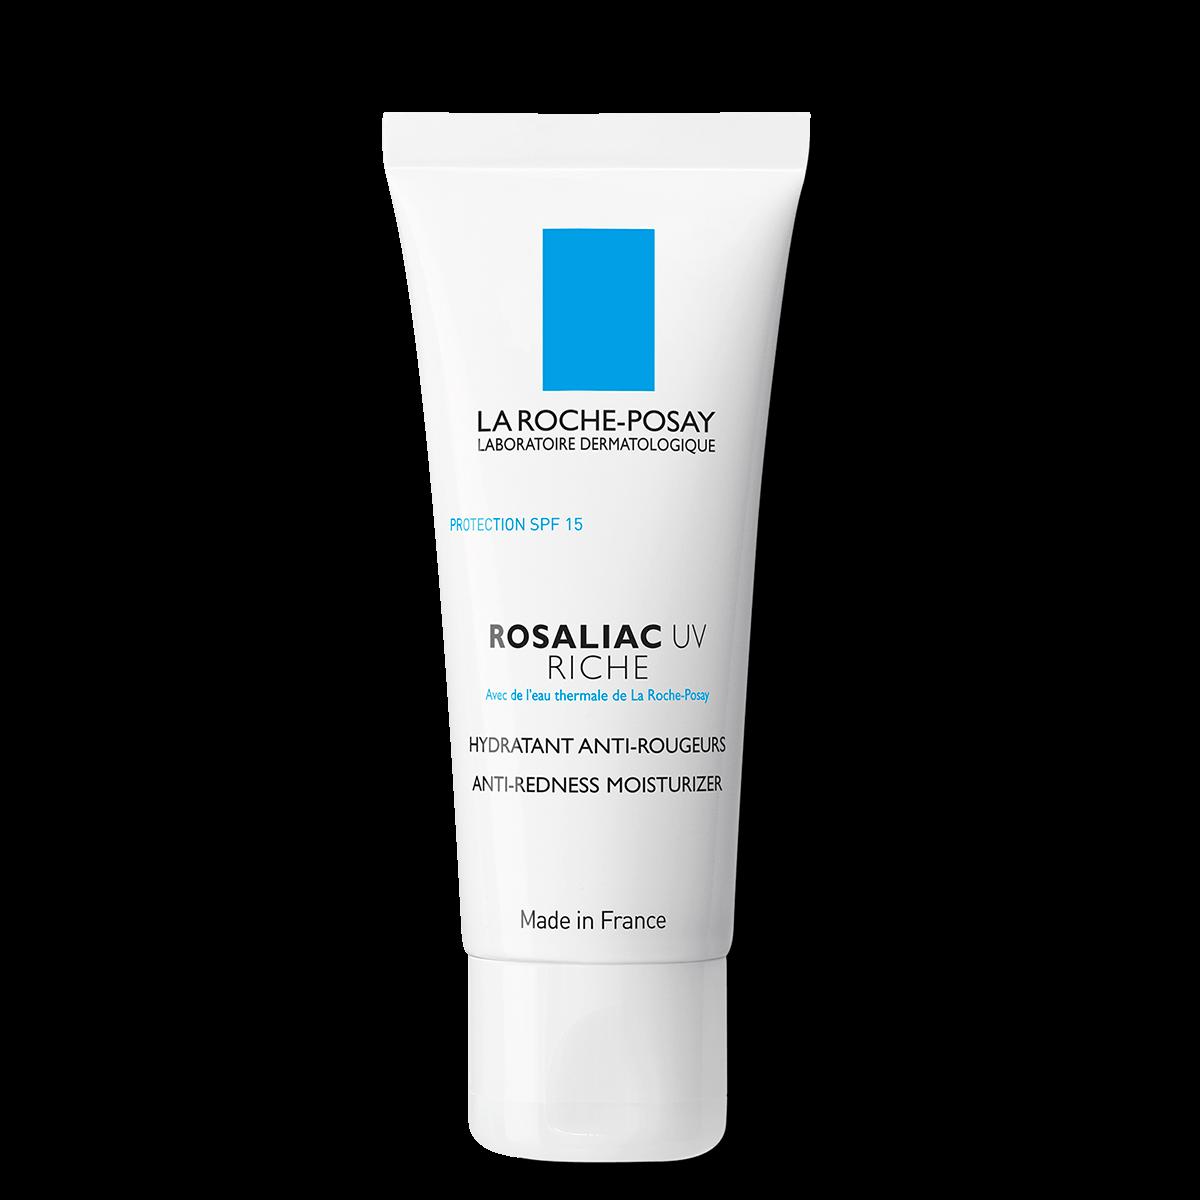 Rosaliac UV Rich Spf 15 40 ml Przód | La Roche Posay